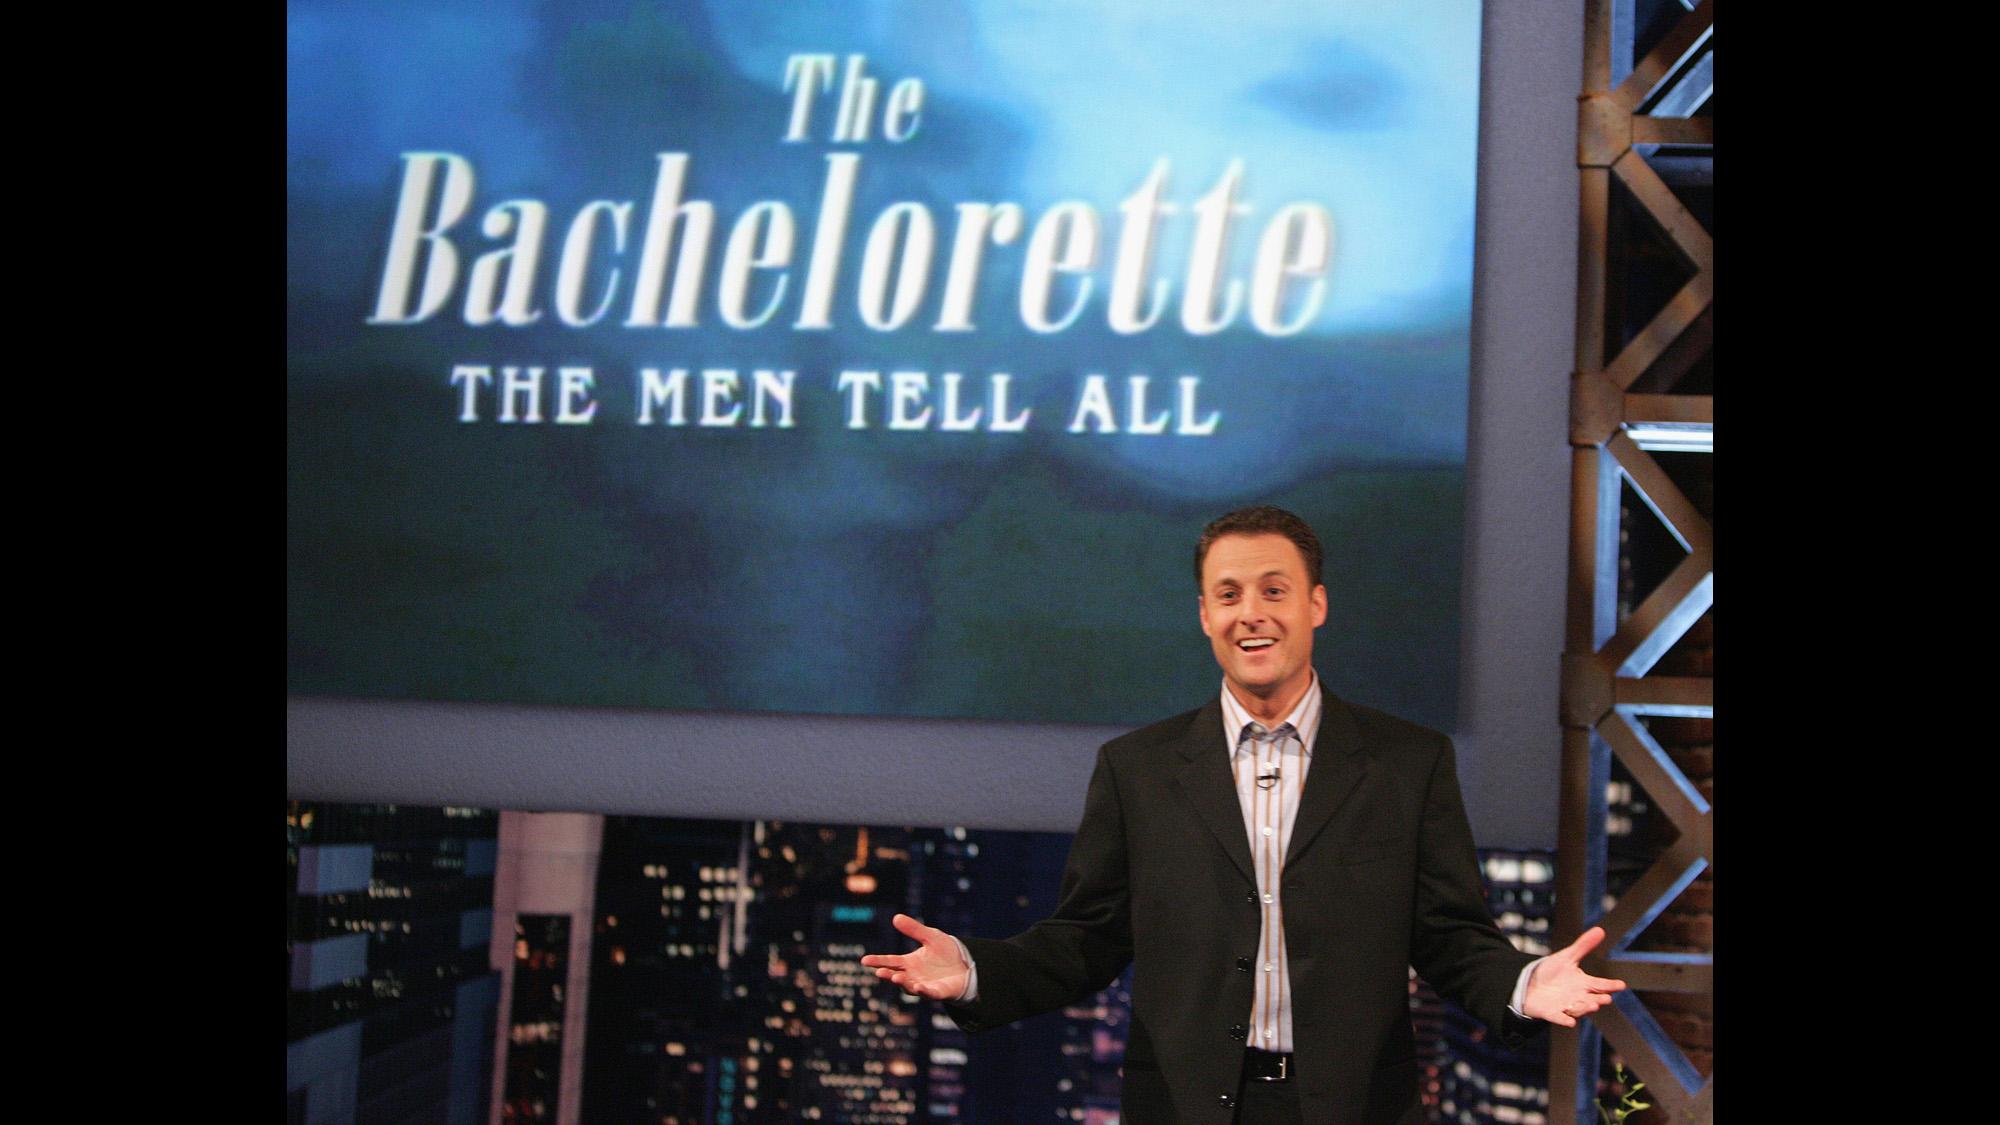 Chris Harrison is leaving 'The Bachelor' franchise for good